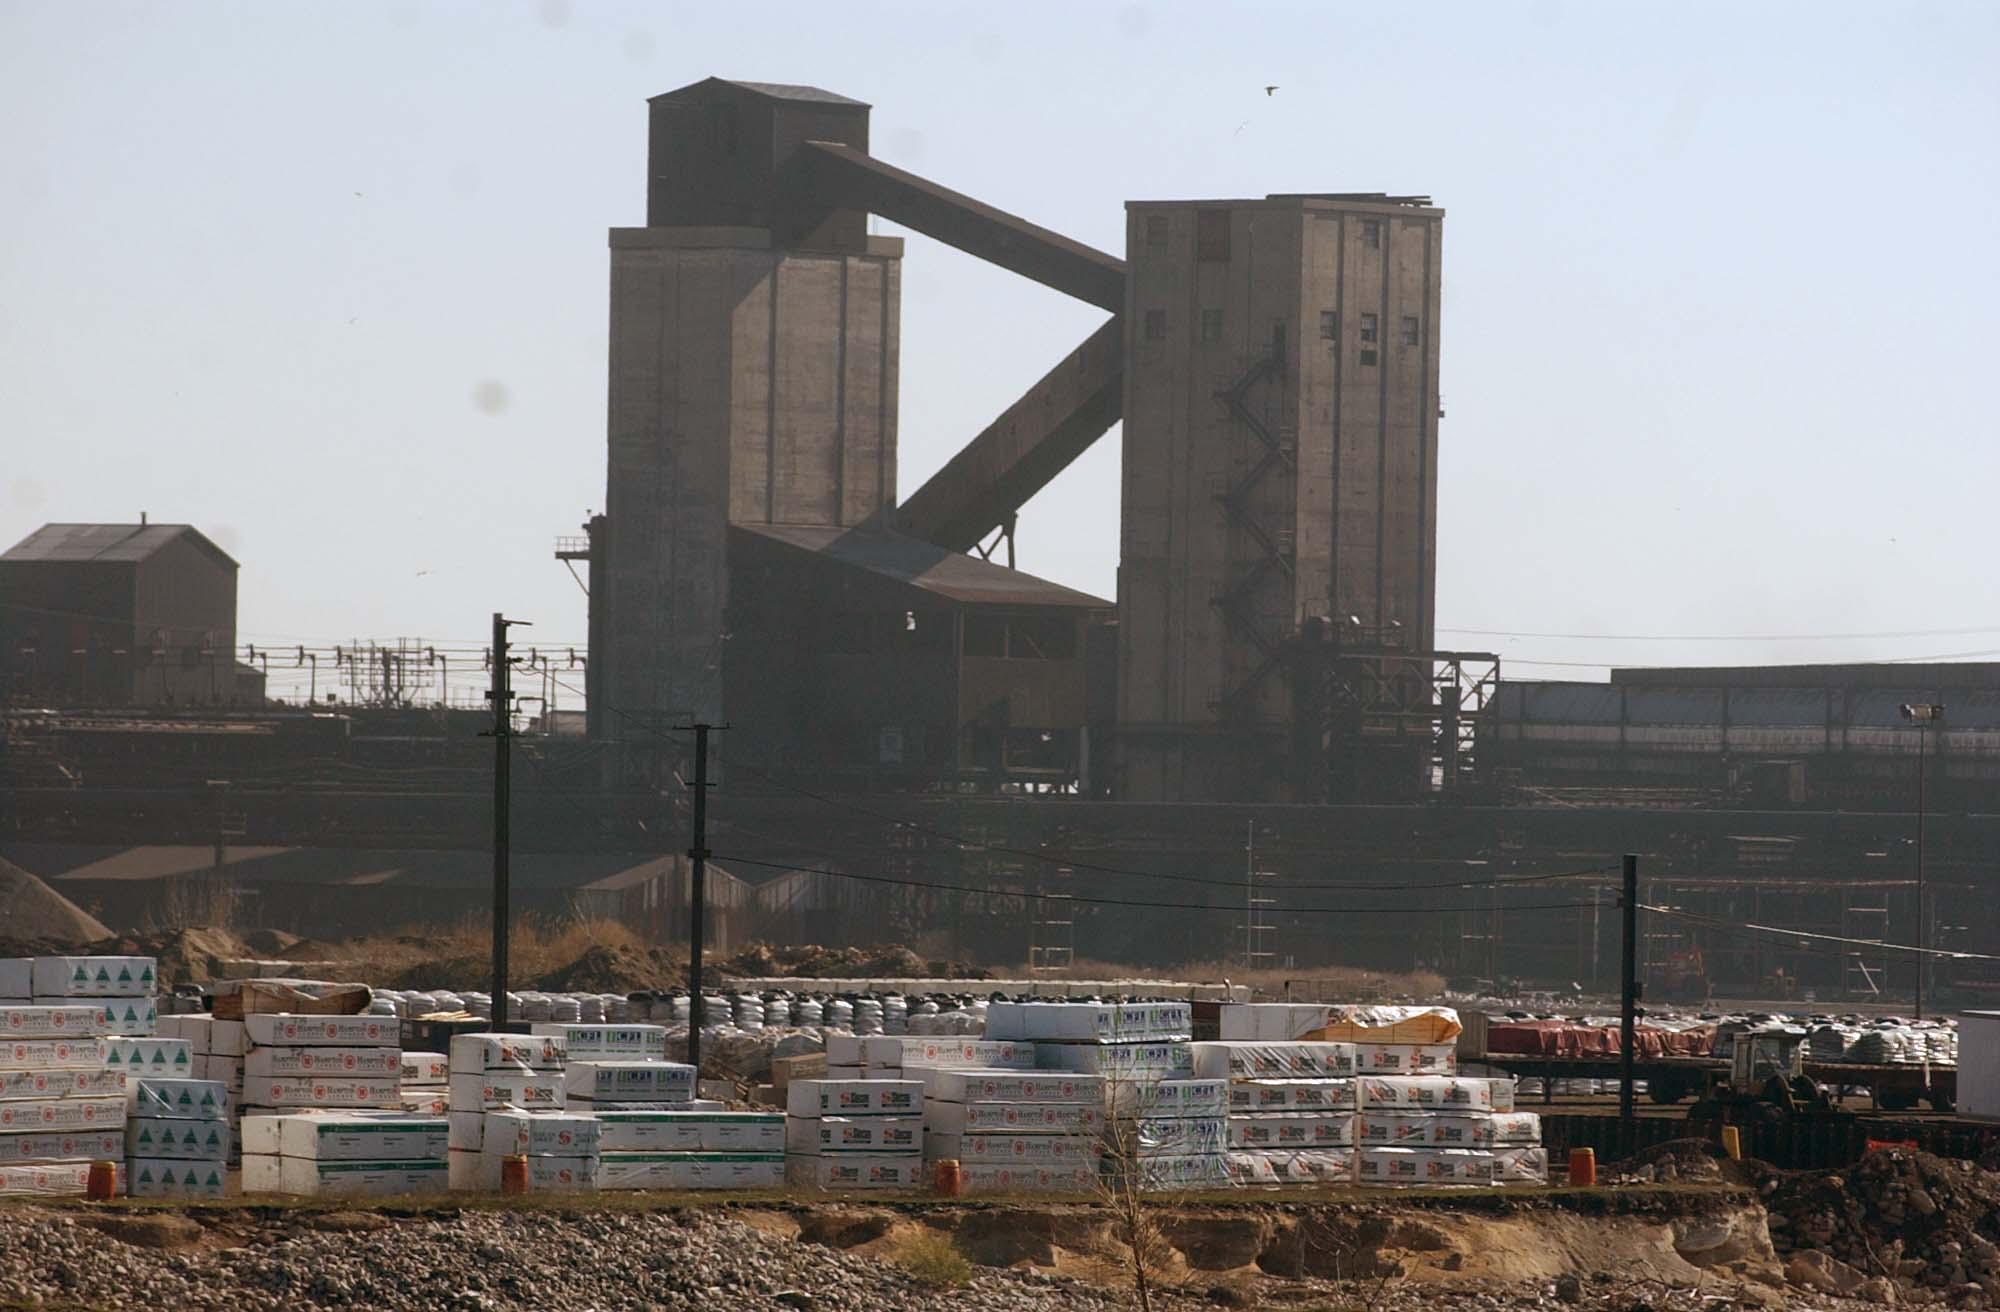 The DEC will hold a public hearing regarding the old Bethlehem Steel site in Lackawanna. (John Hickey/Buffalo News)